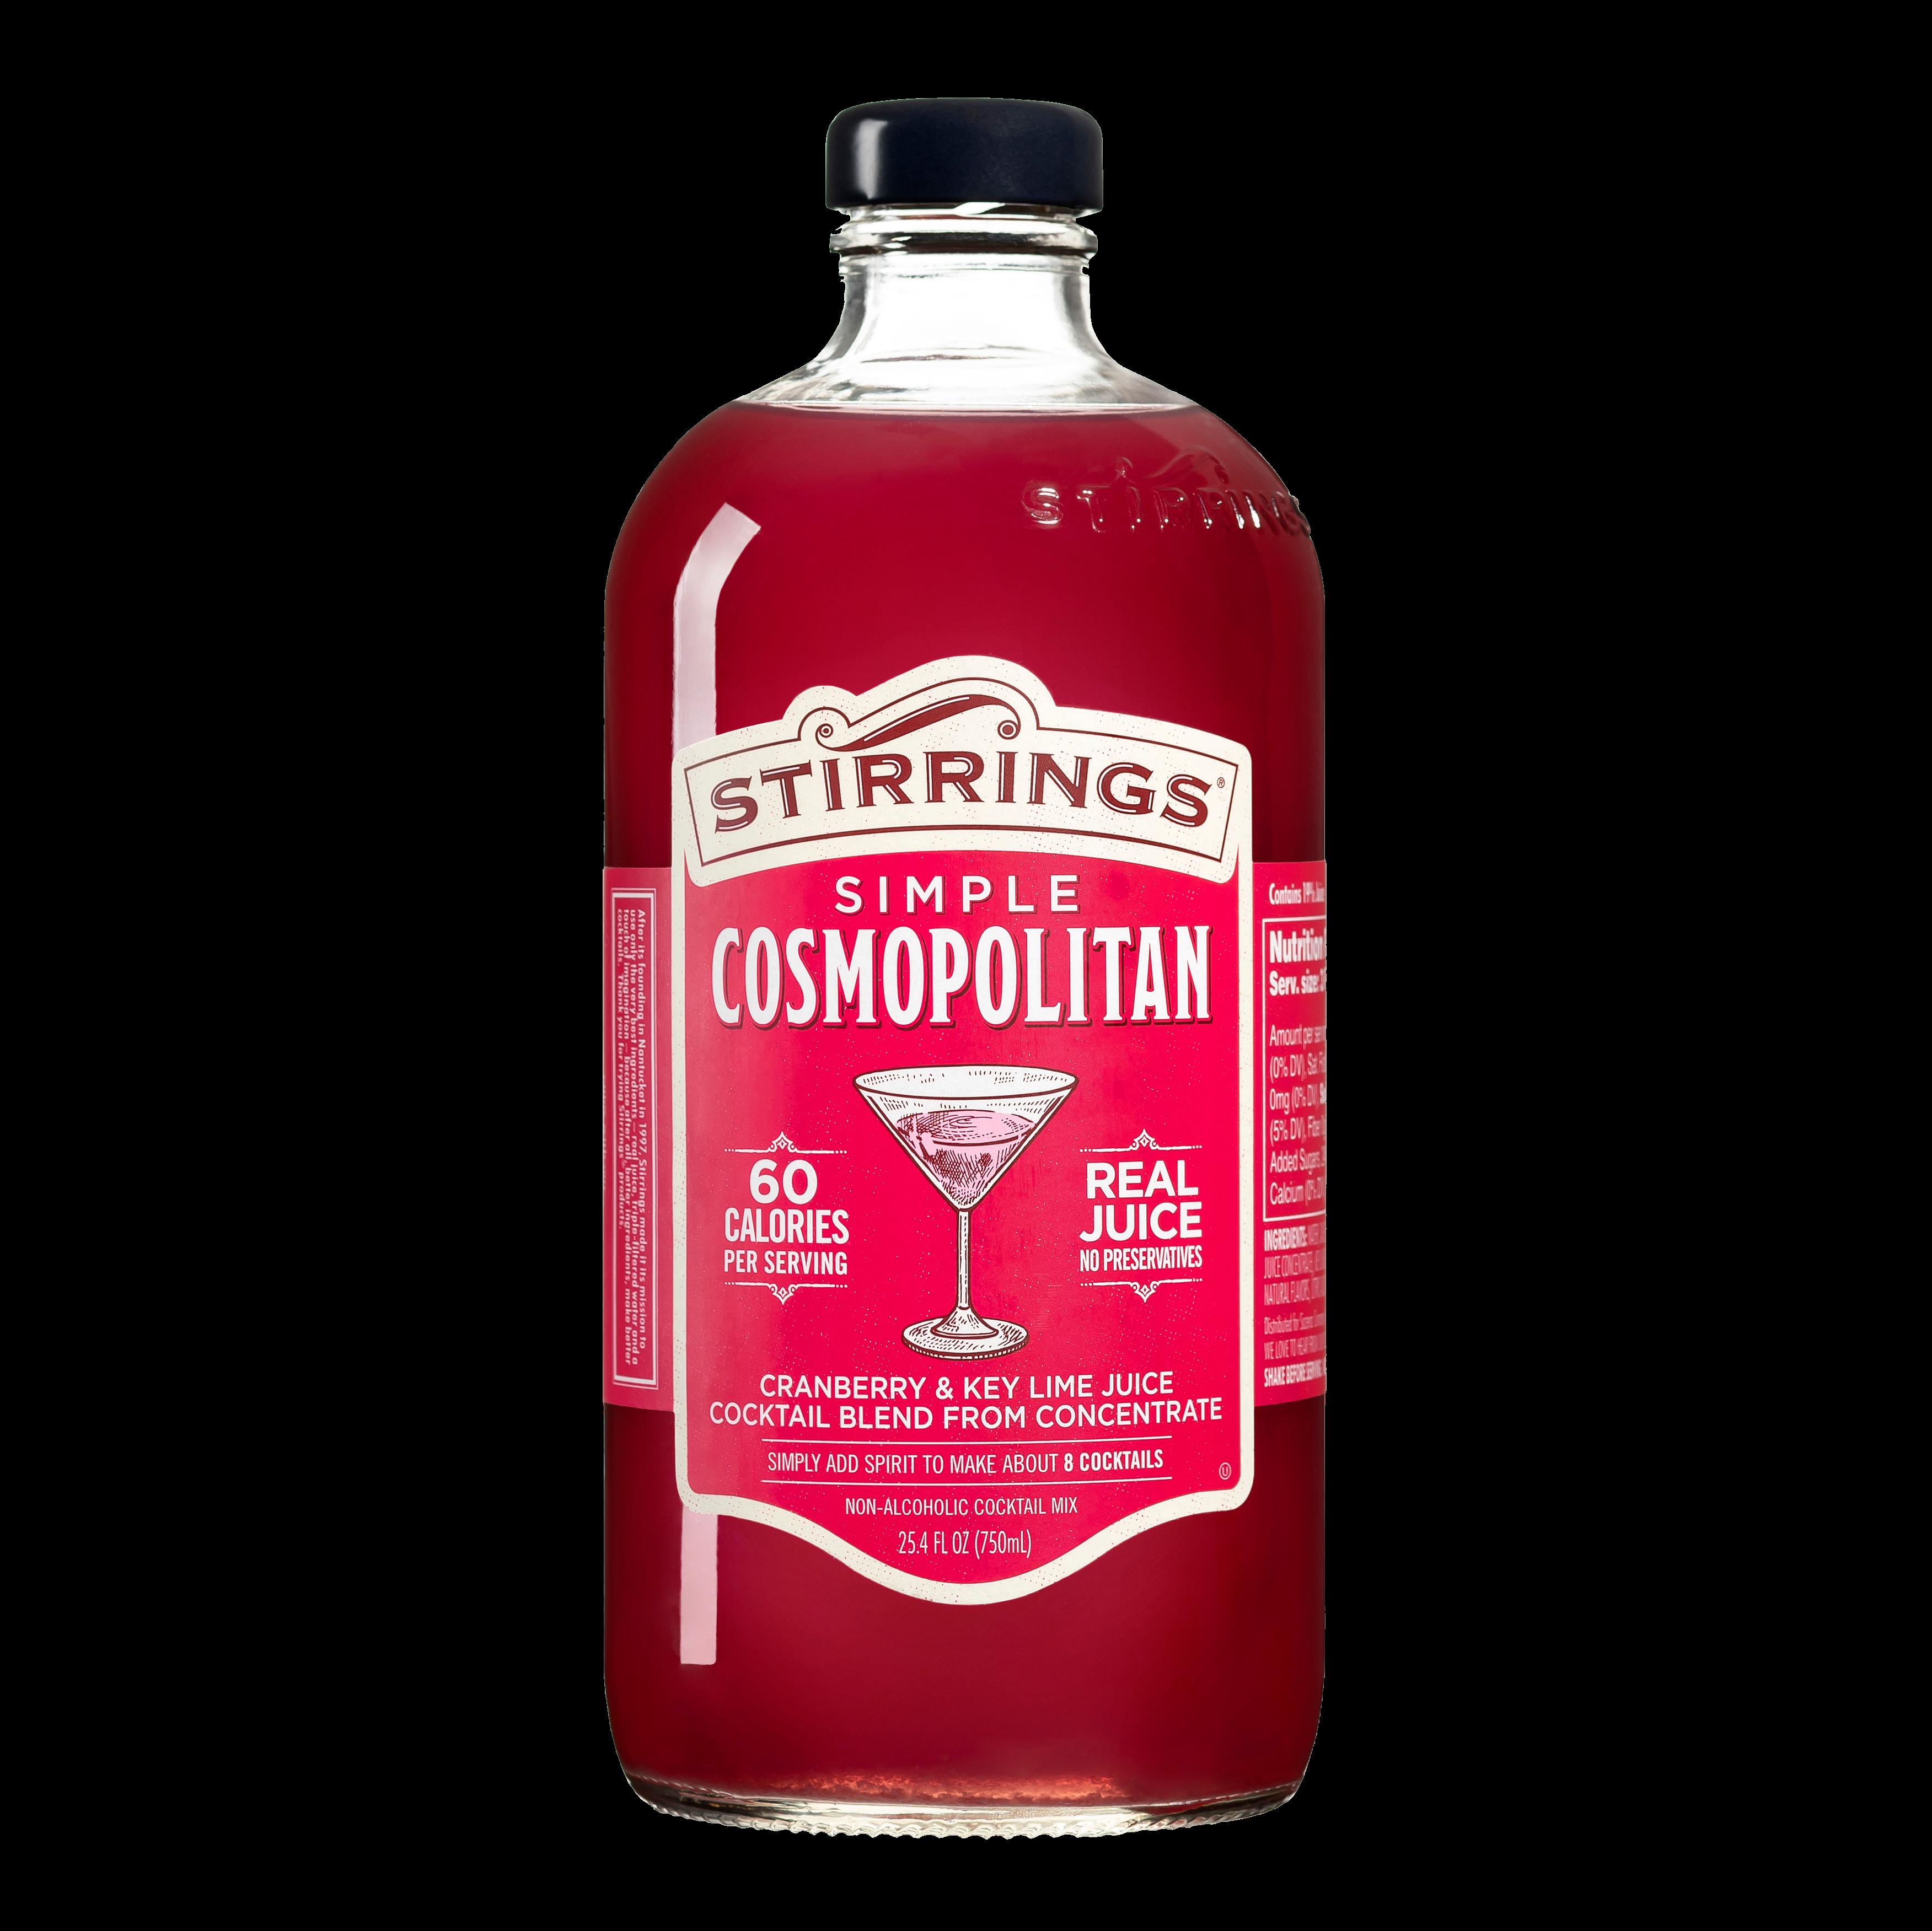 Stirrings Cosmopolitan